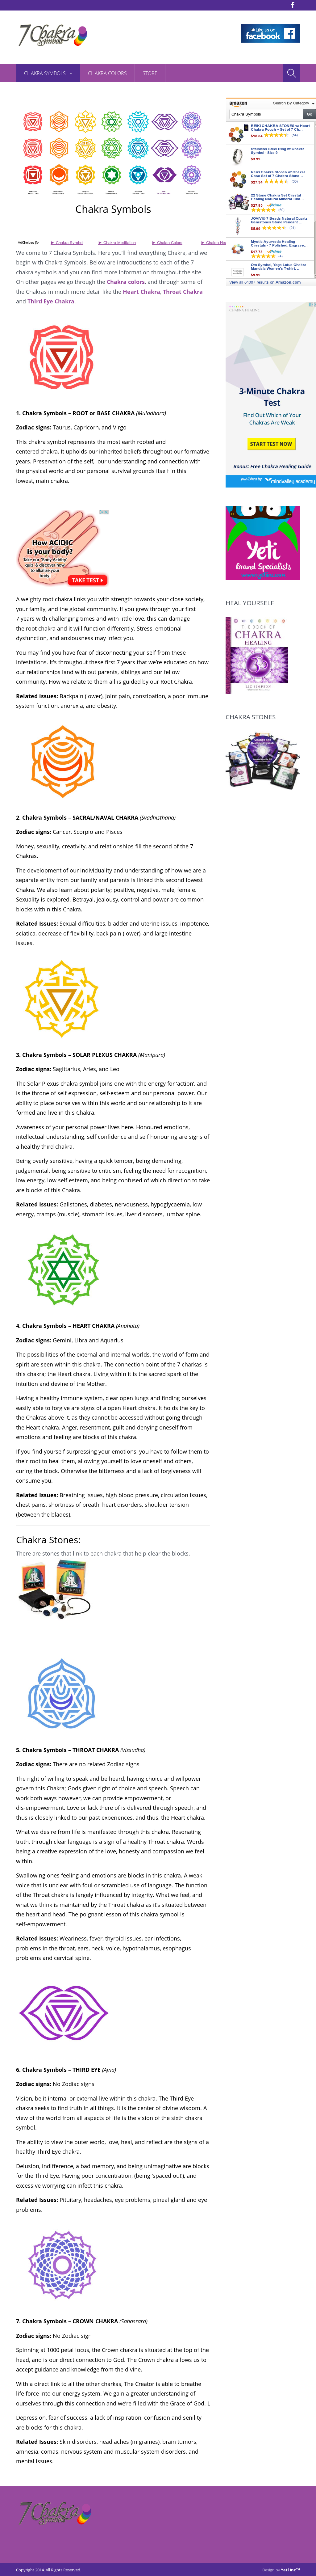 7 Chakra Symbols Competitors, Revenue and Employees - Owler Company